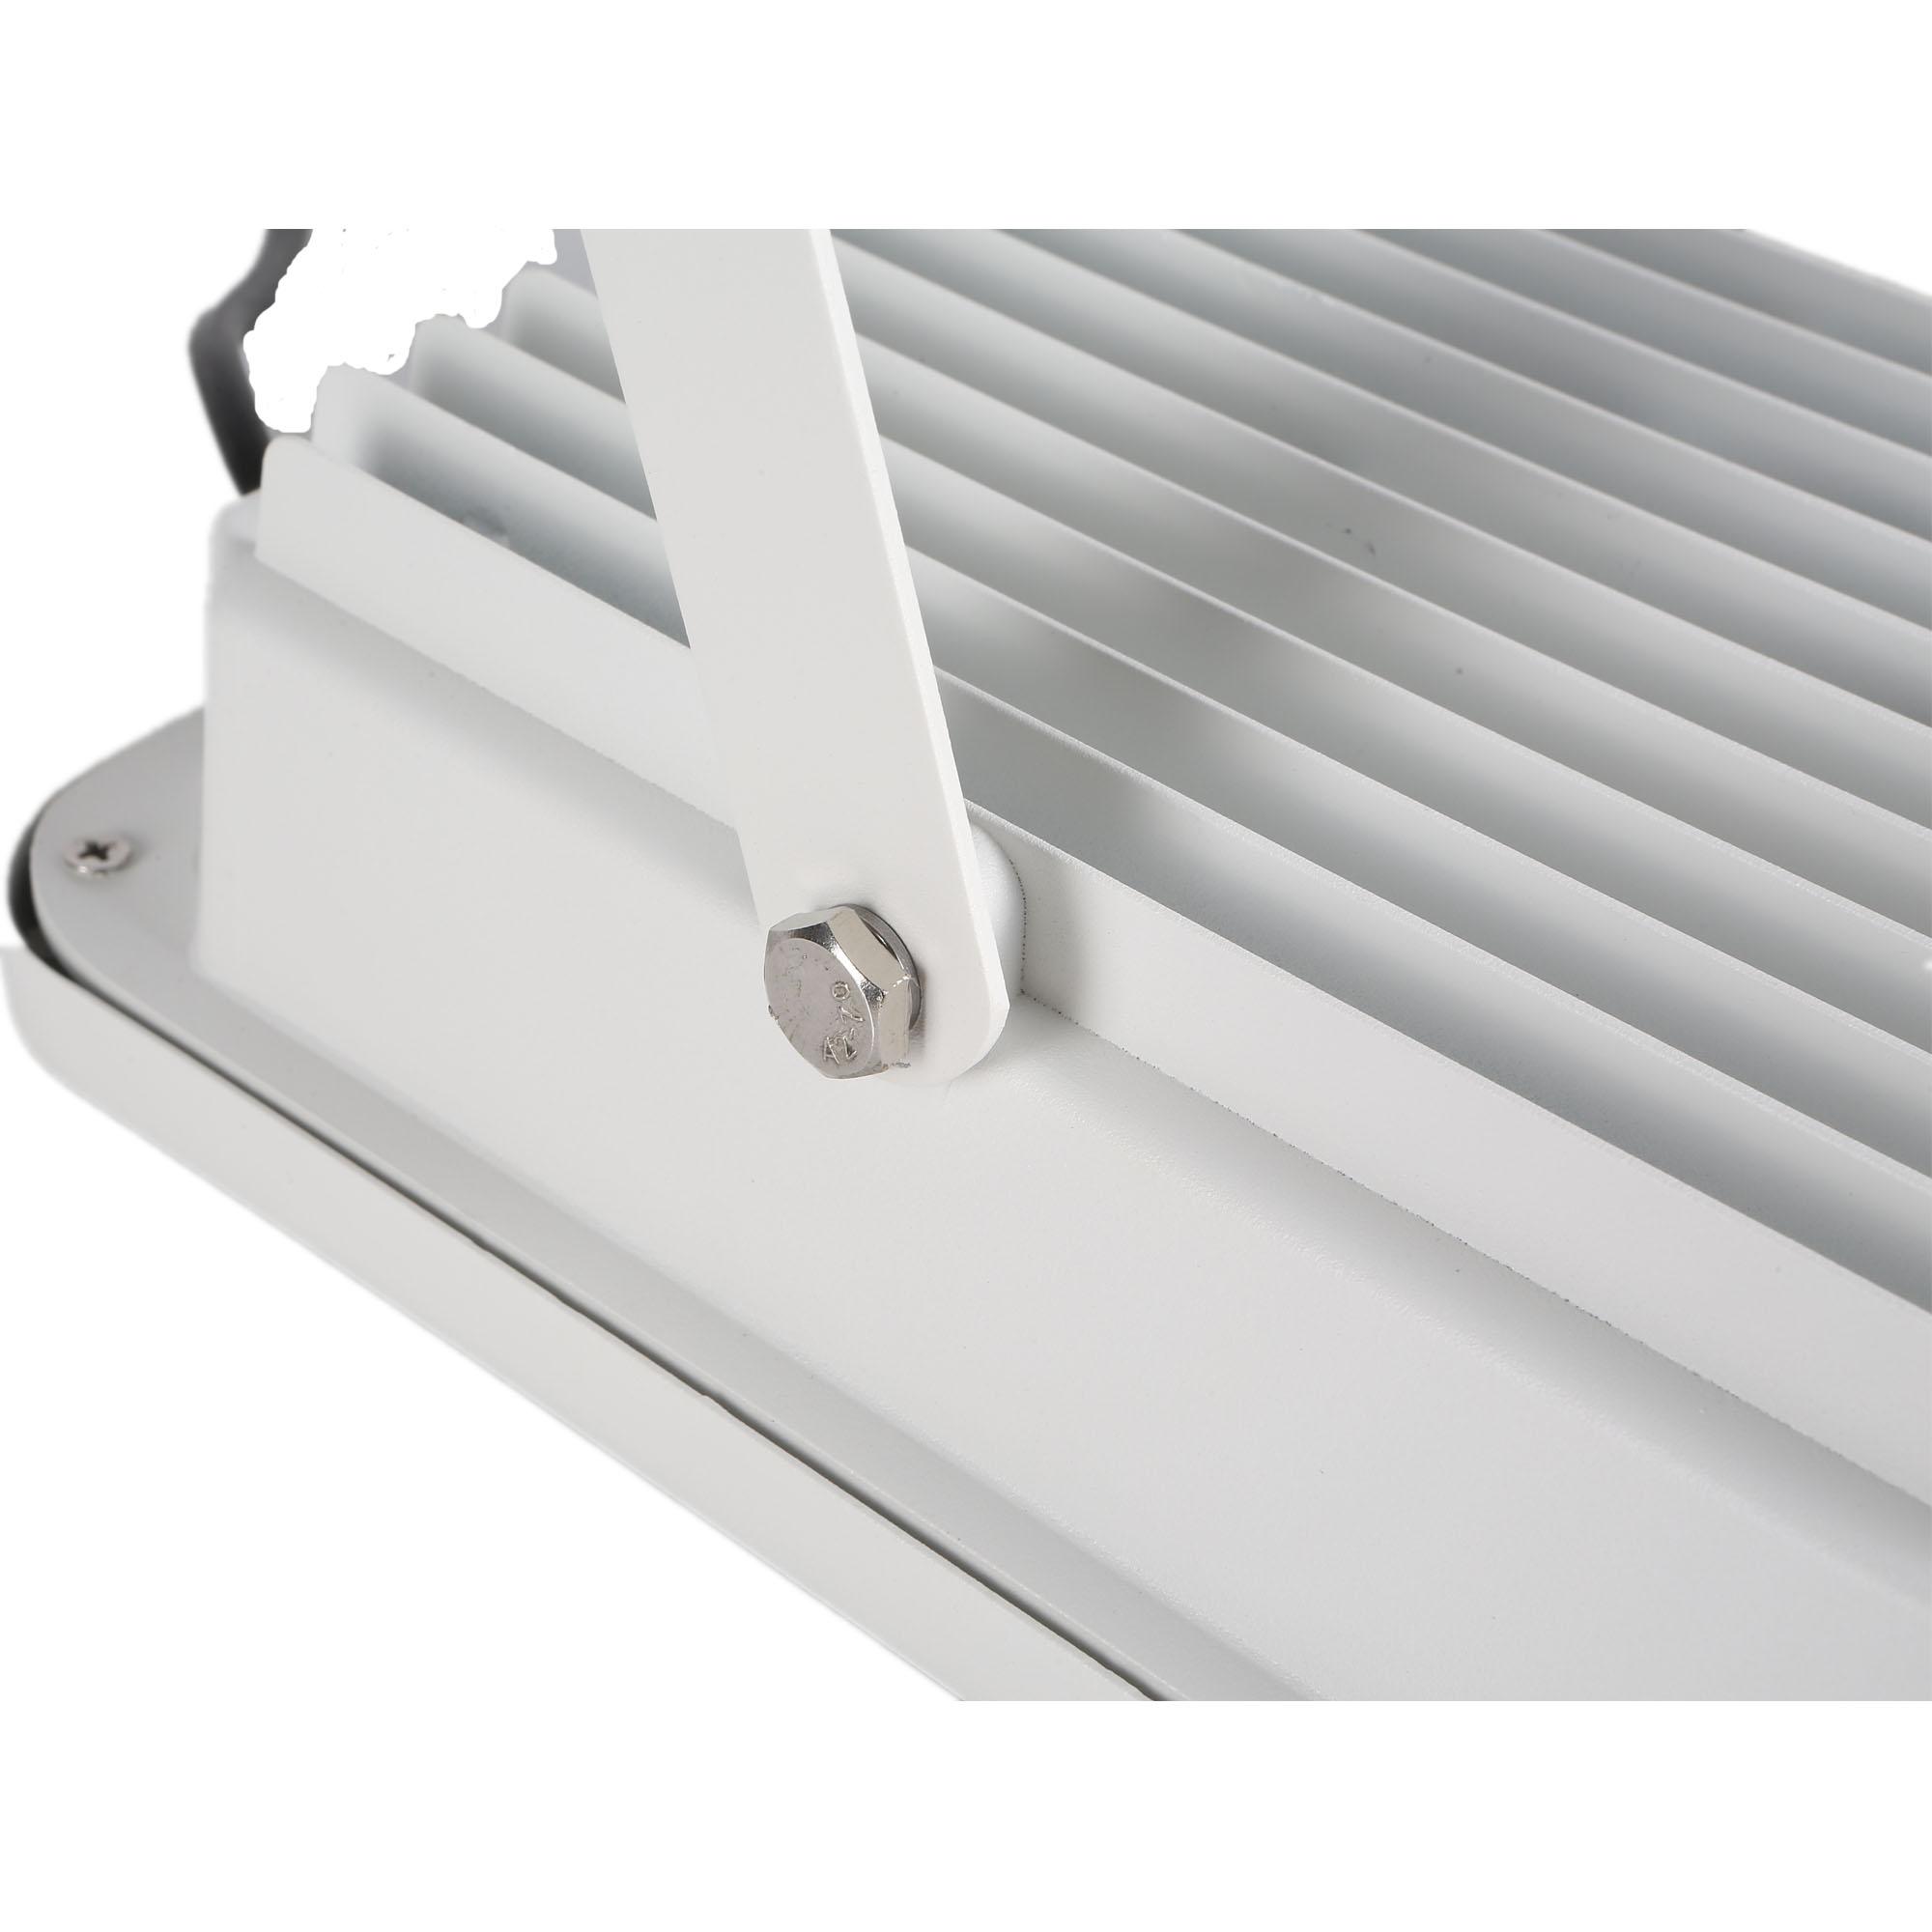 30w led scheinwerfer wasserdicht ip65 au enbeleuchtung baustrahler lampe kalt ebay. Black Bedroom Furniture Sets. Home Design Ideas